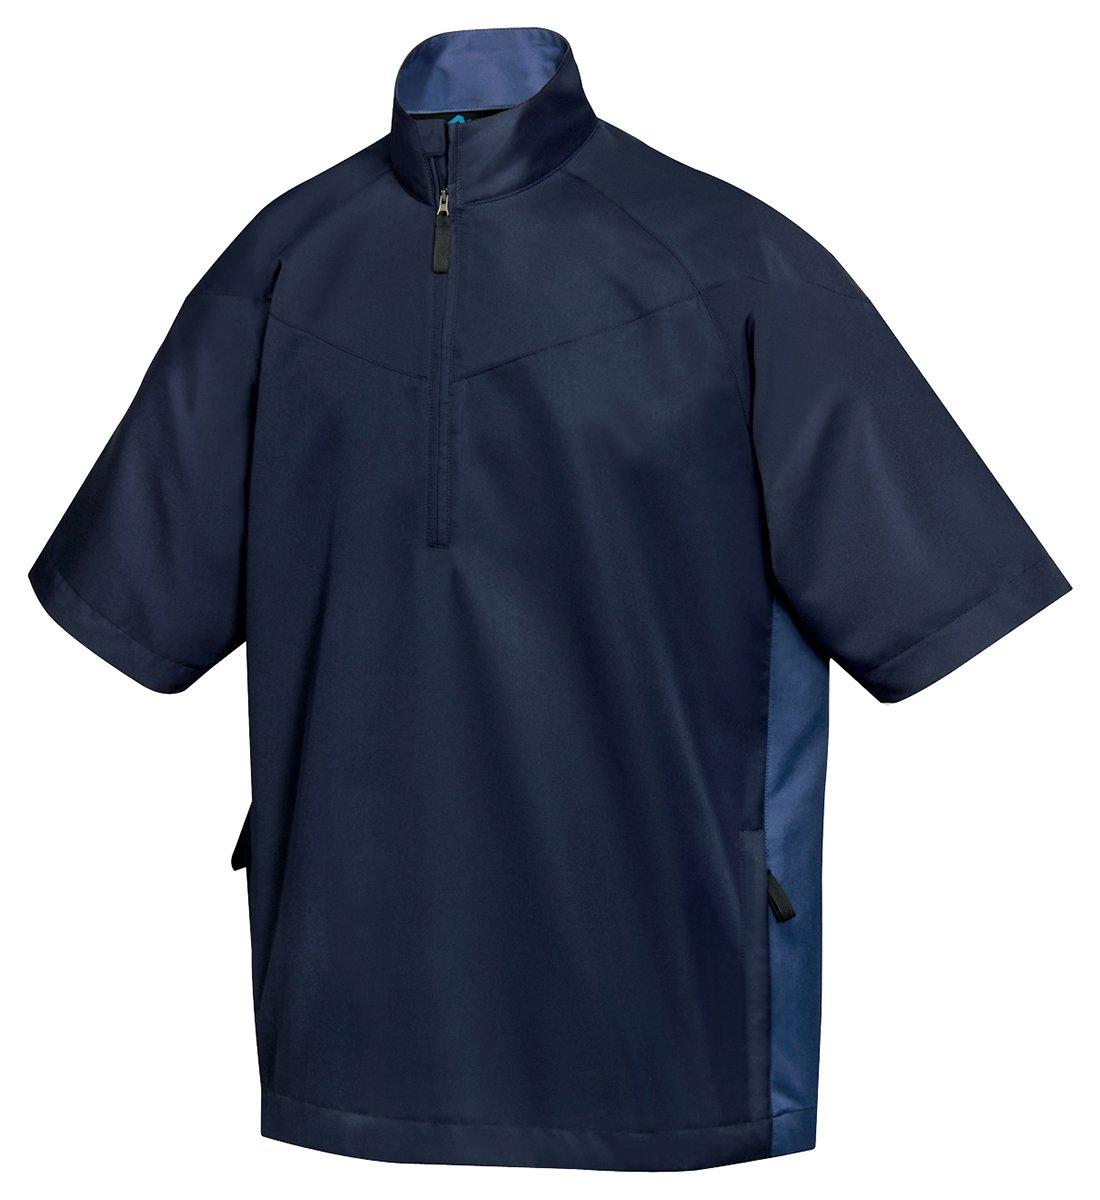 Tri-Mountain All Season Half Zip Short Sleeve Windshirt - 2610 Icon, NAVY/MOUNTAIN BLUE, X-Large